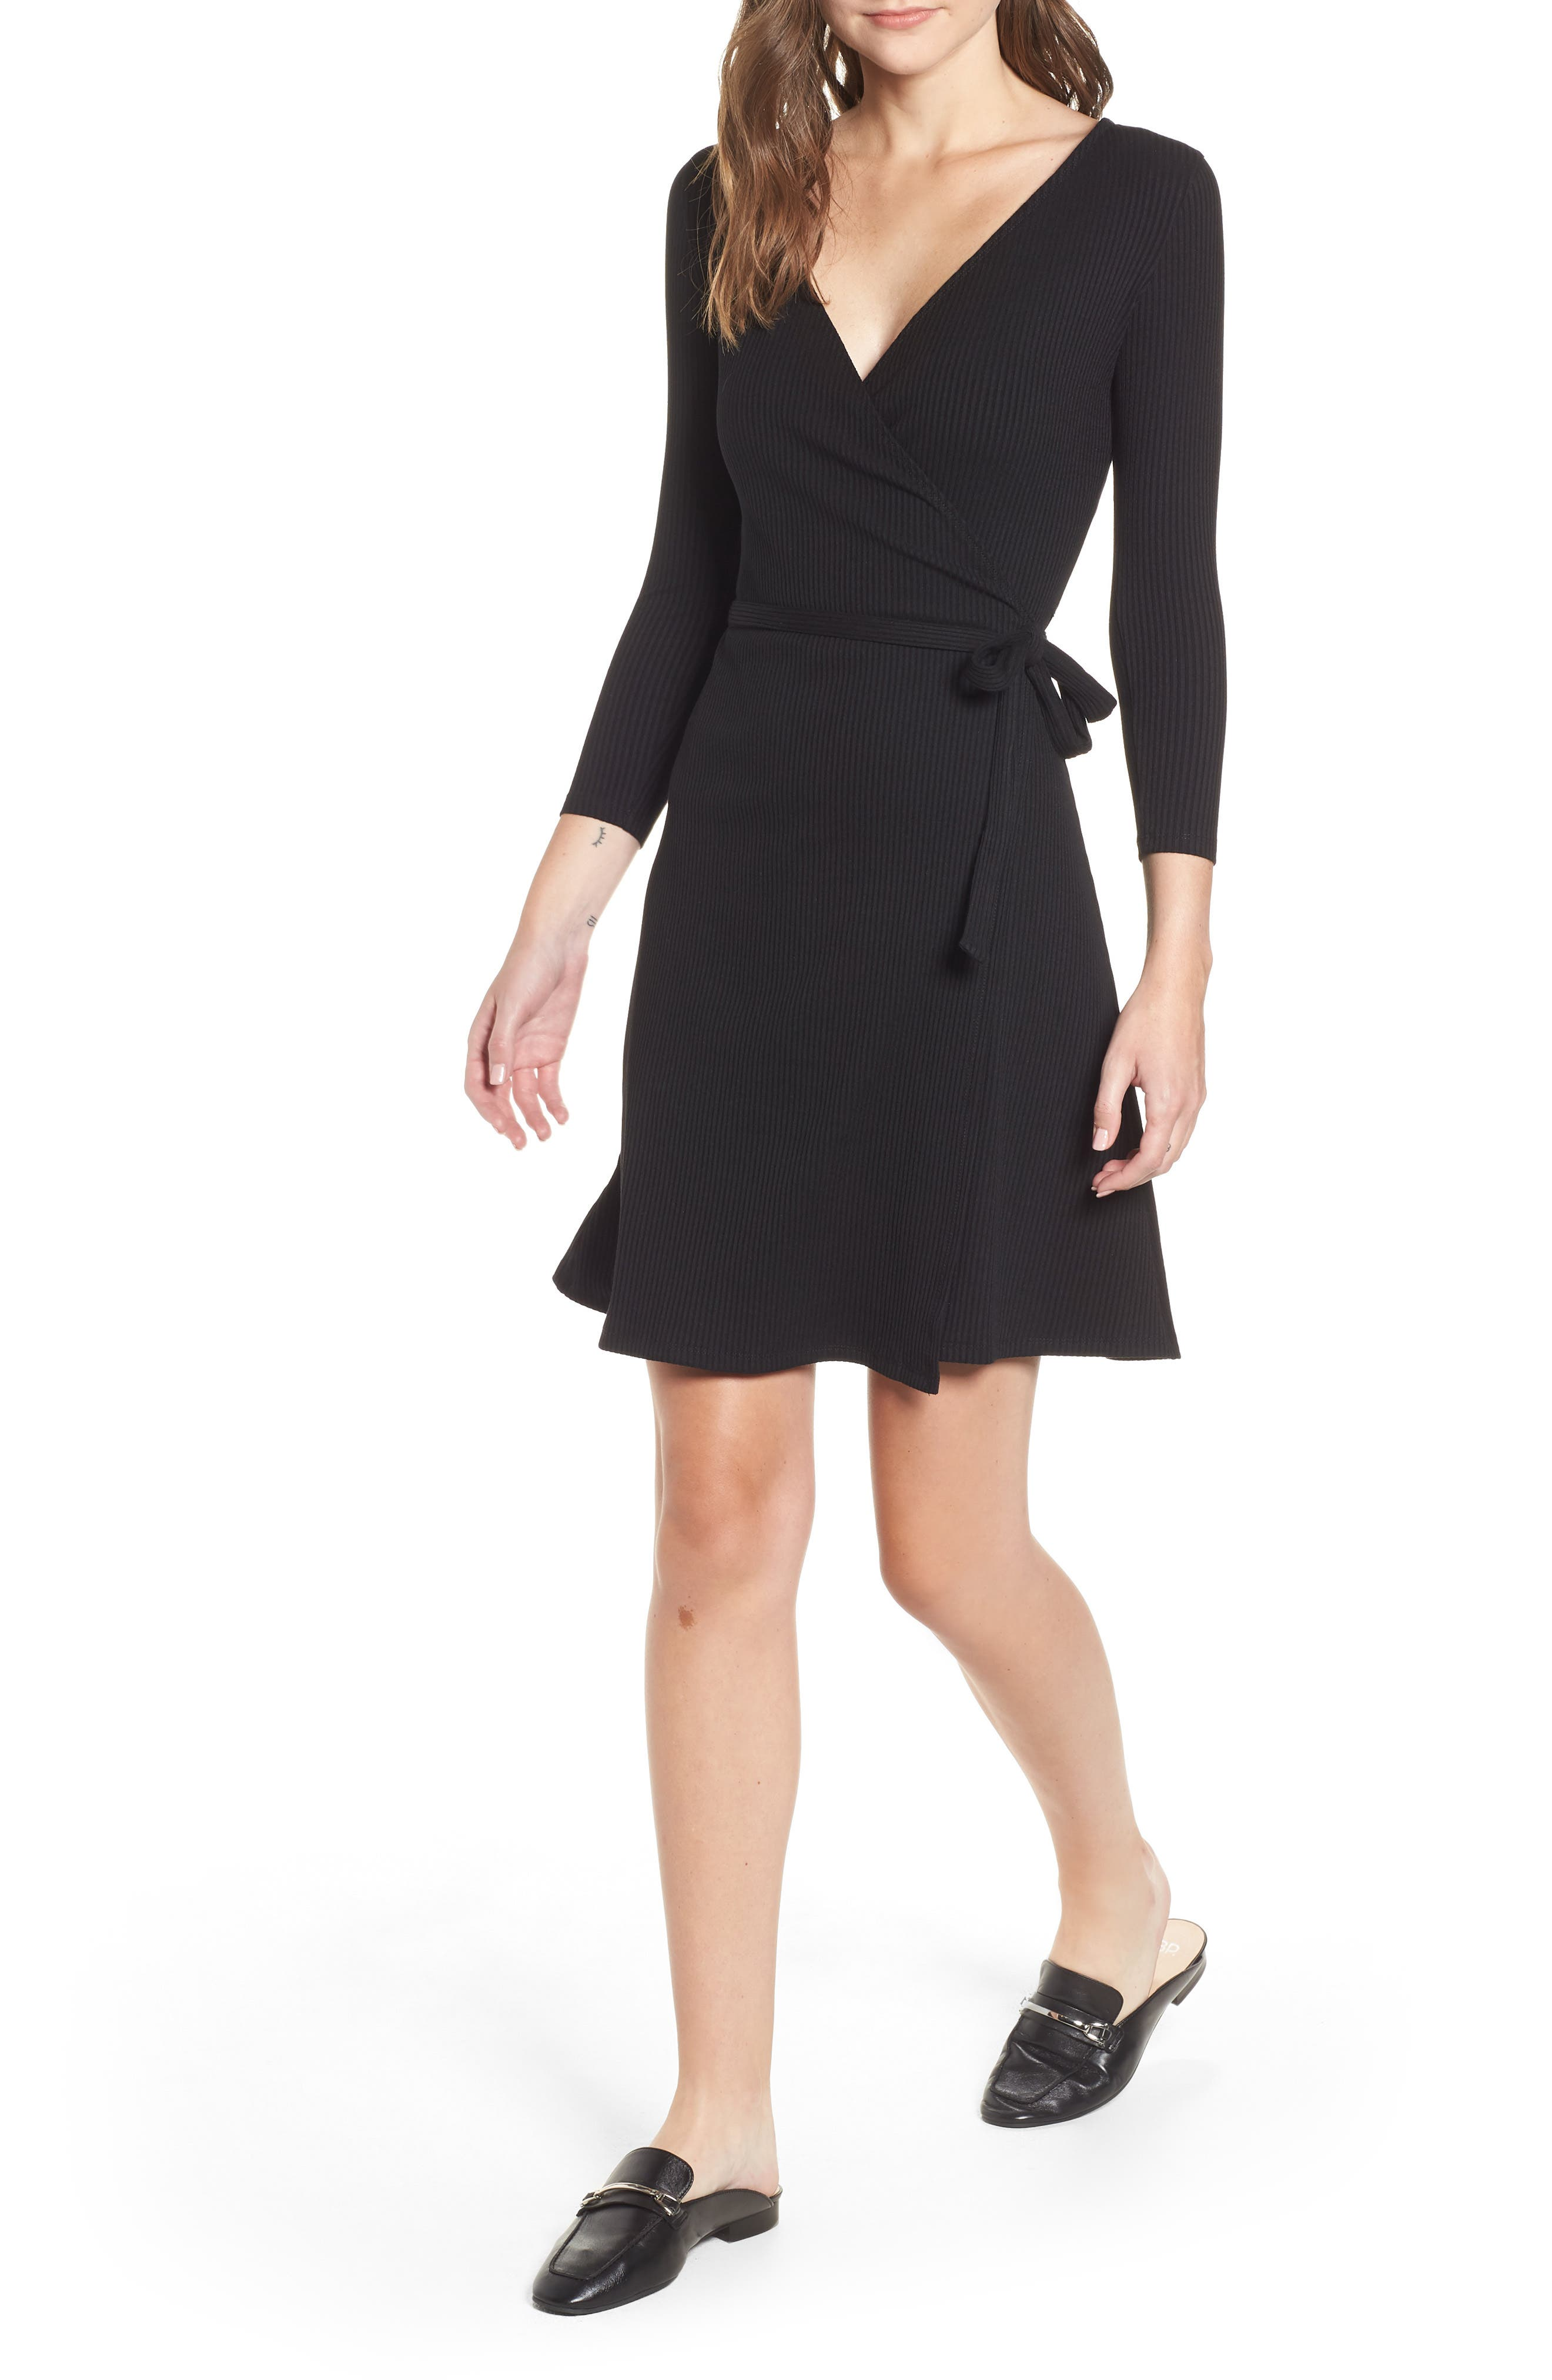 AMOUR VERT Theodora Rib Wrap Dress in Black